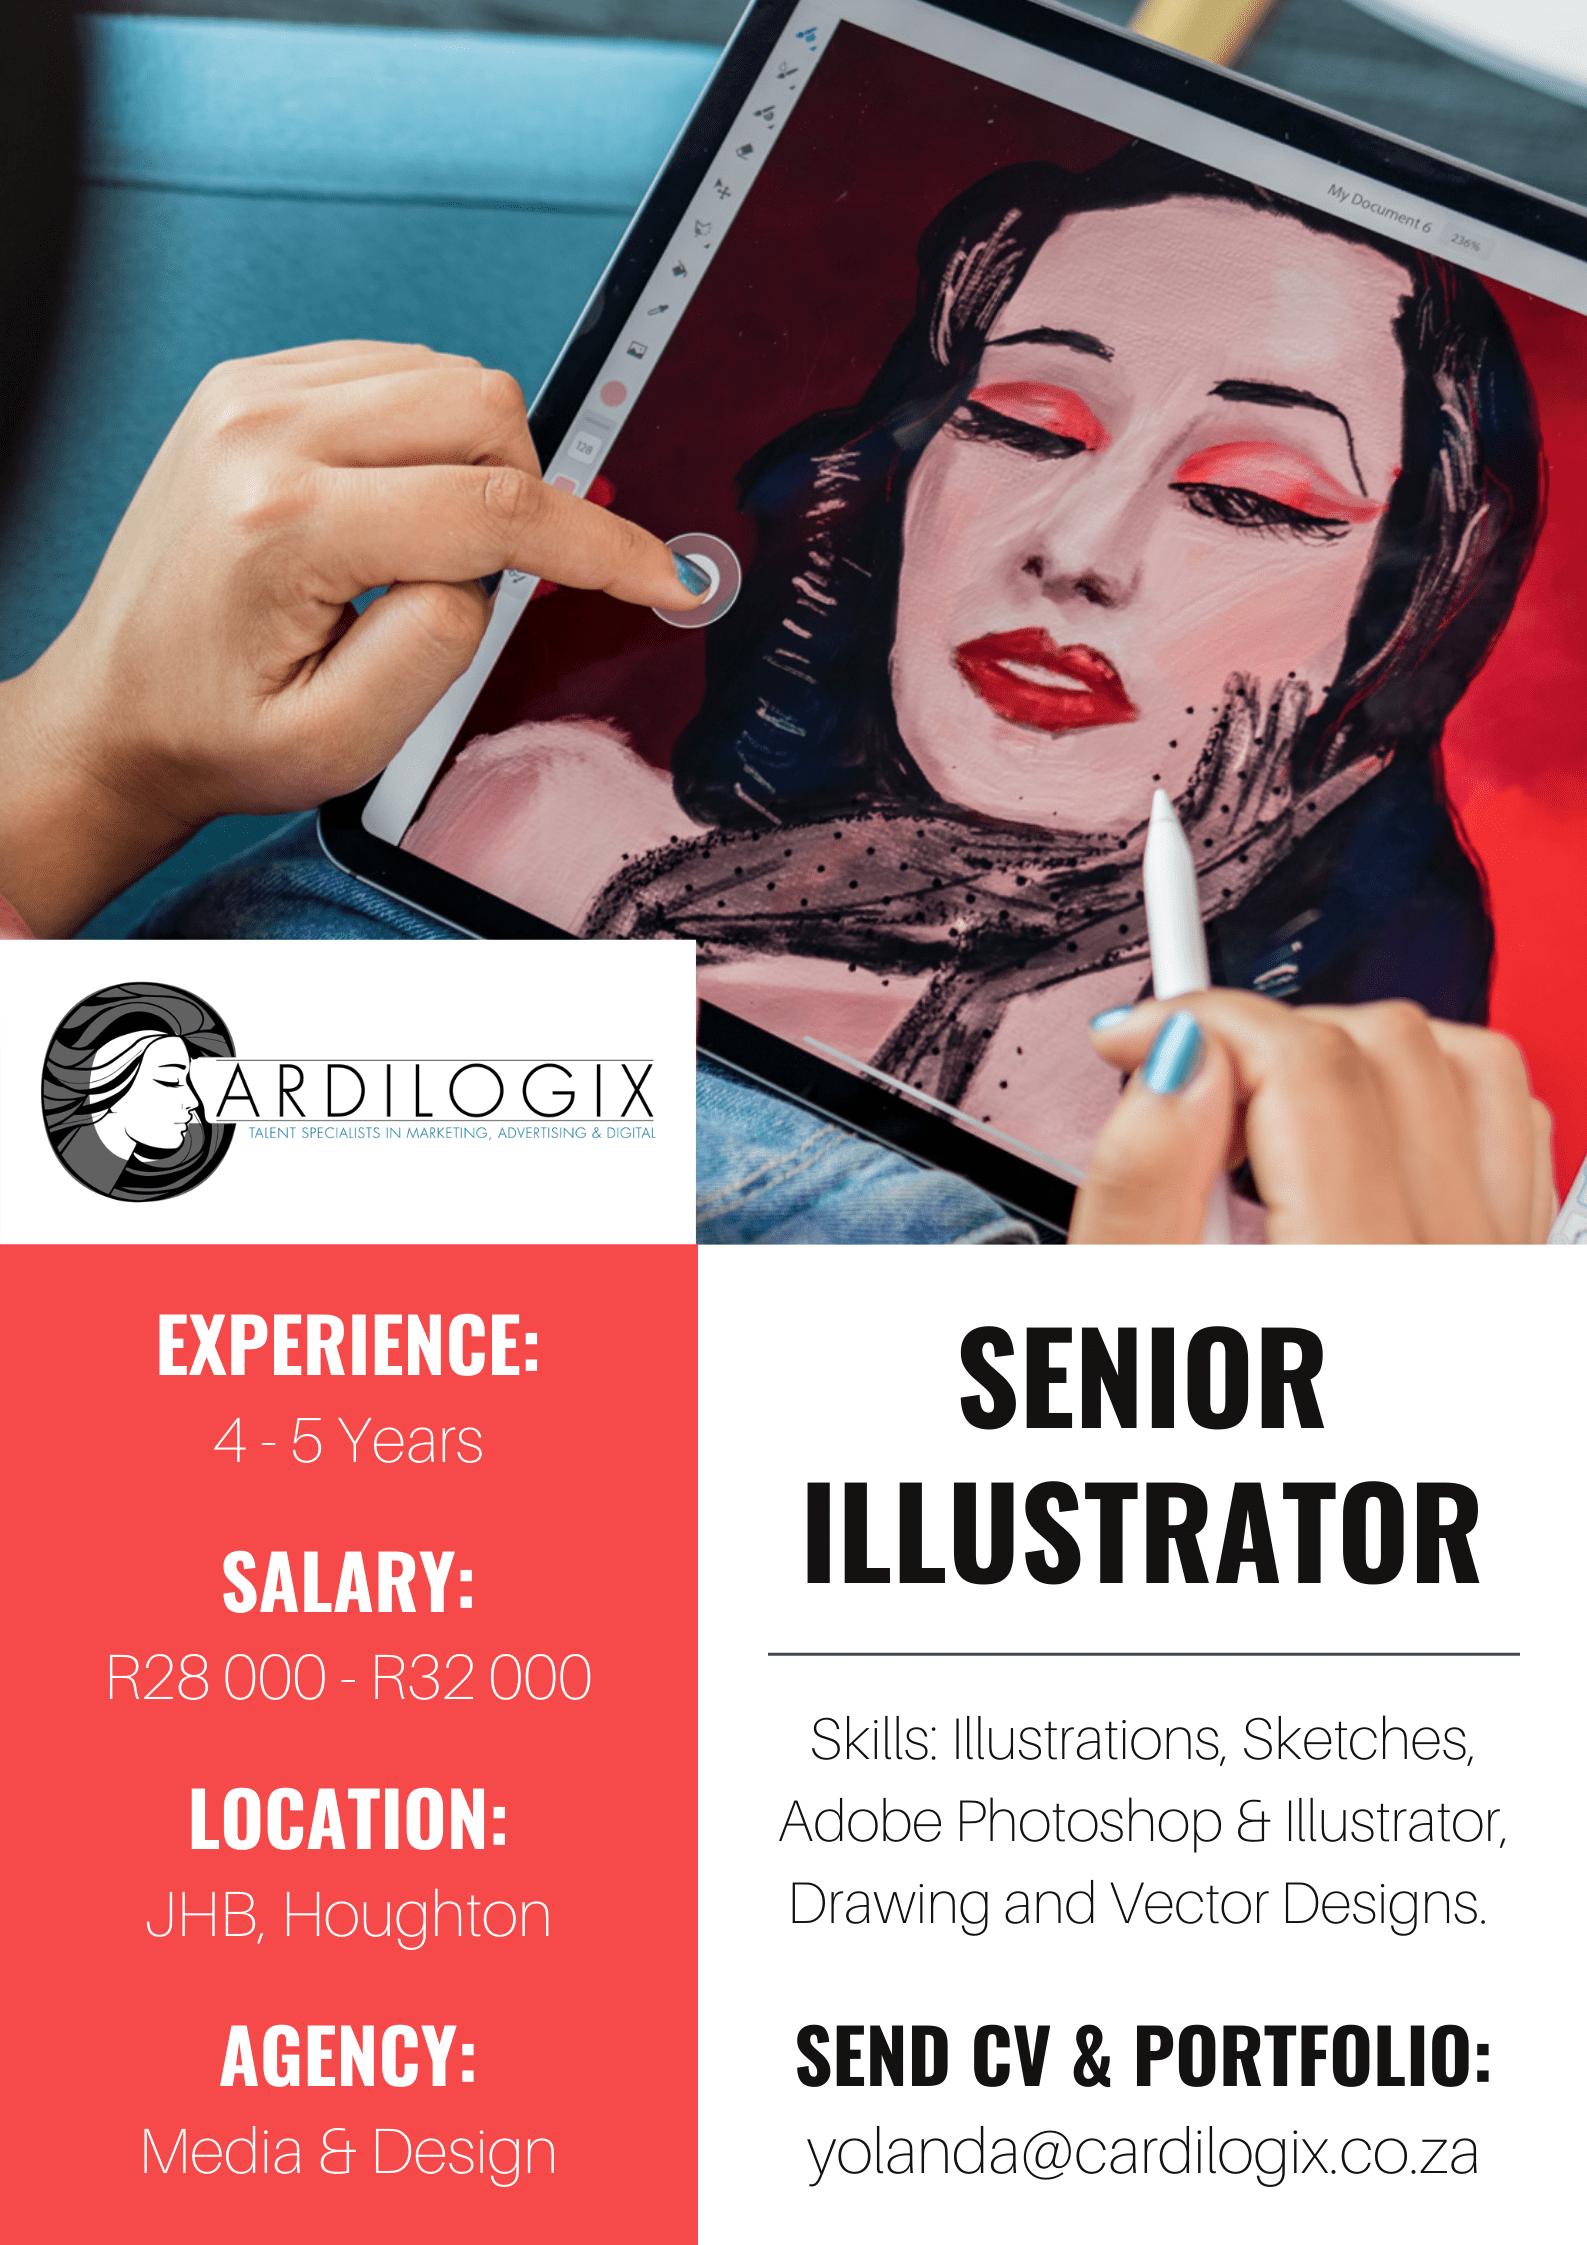 Senior Illustrator